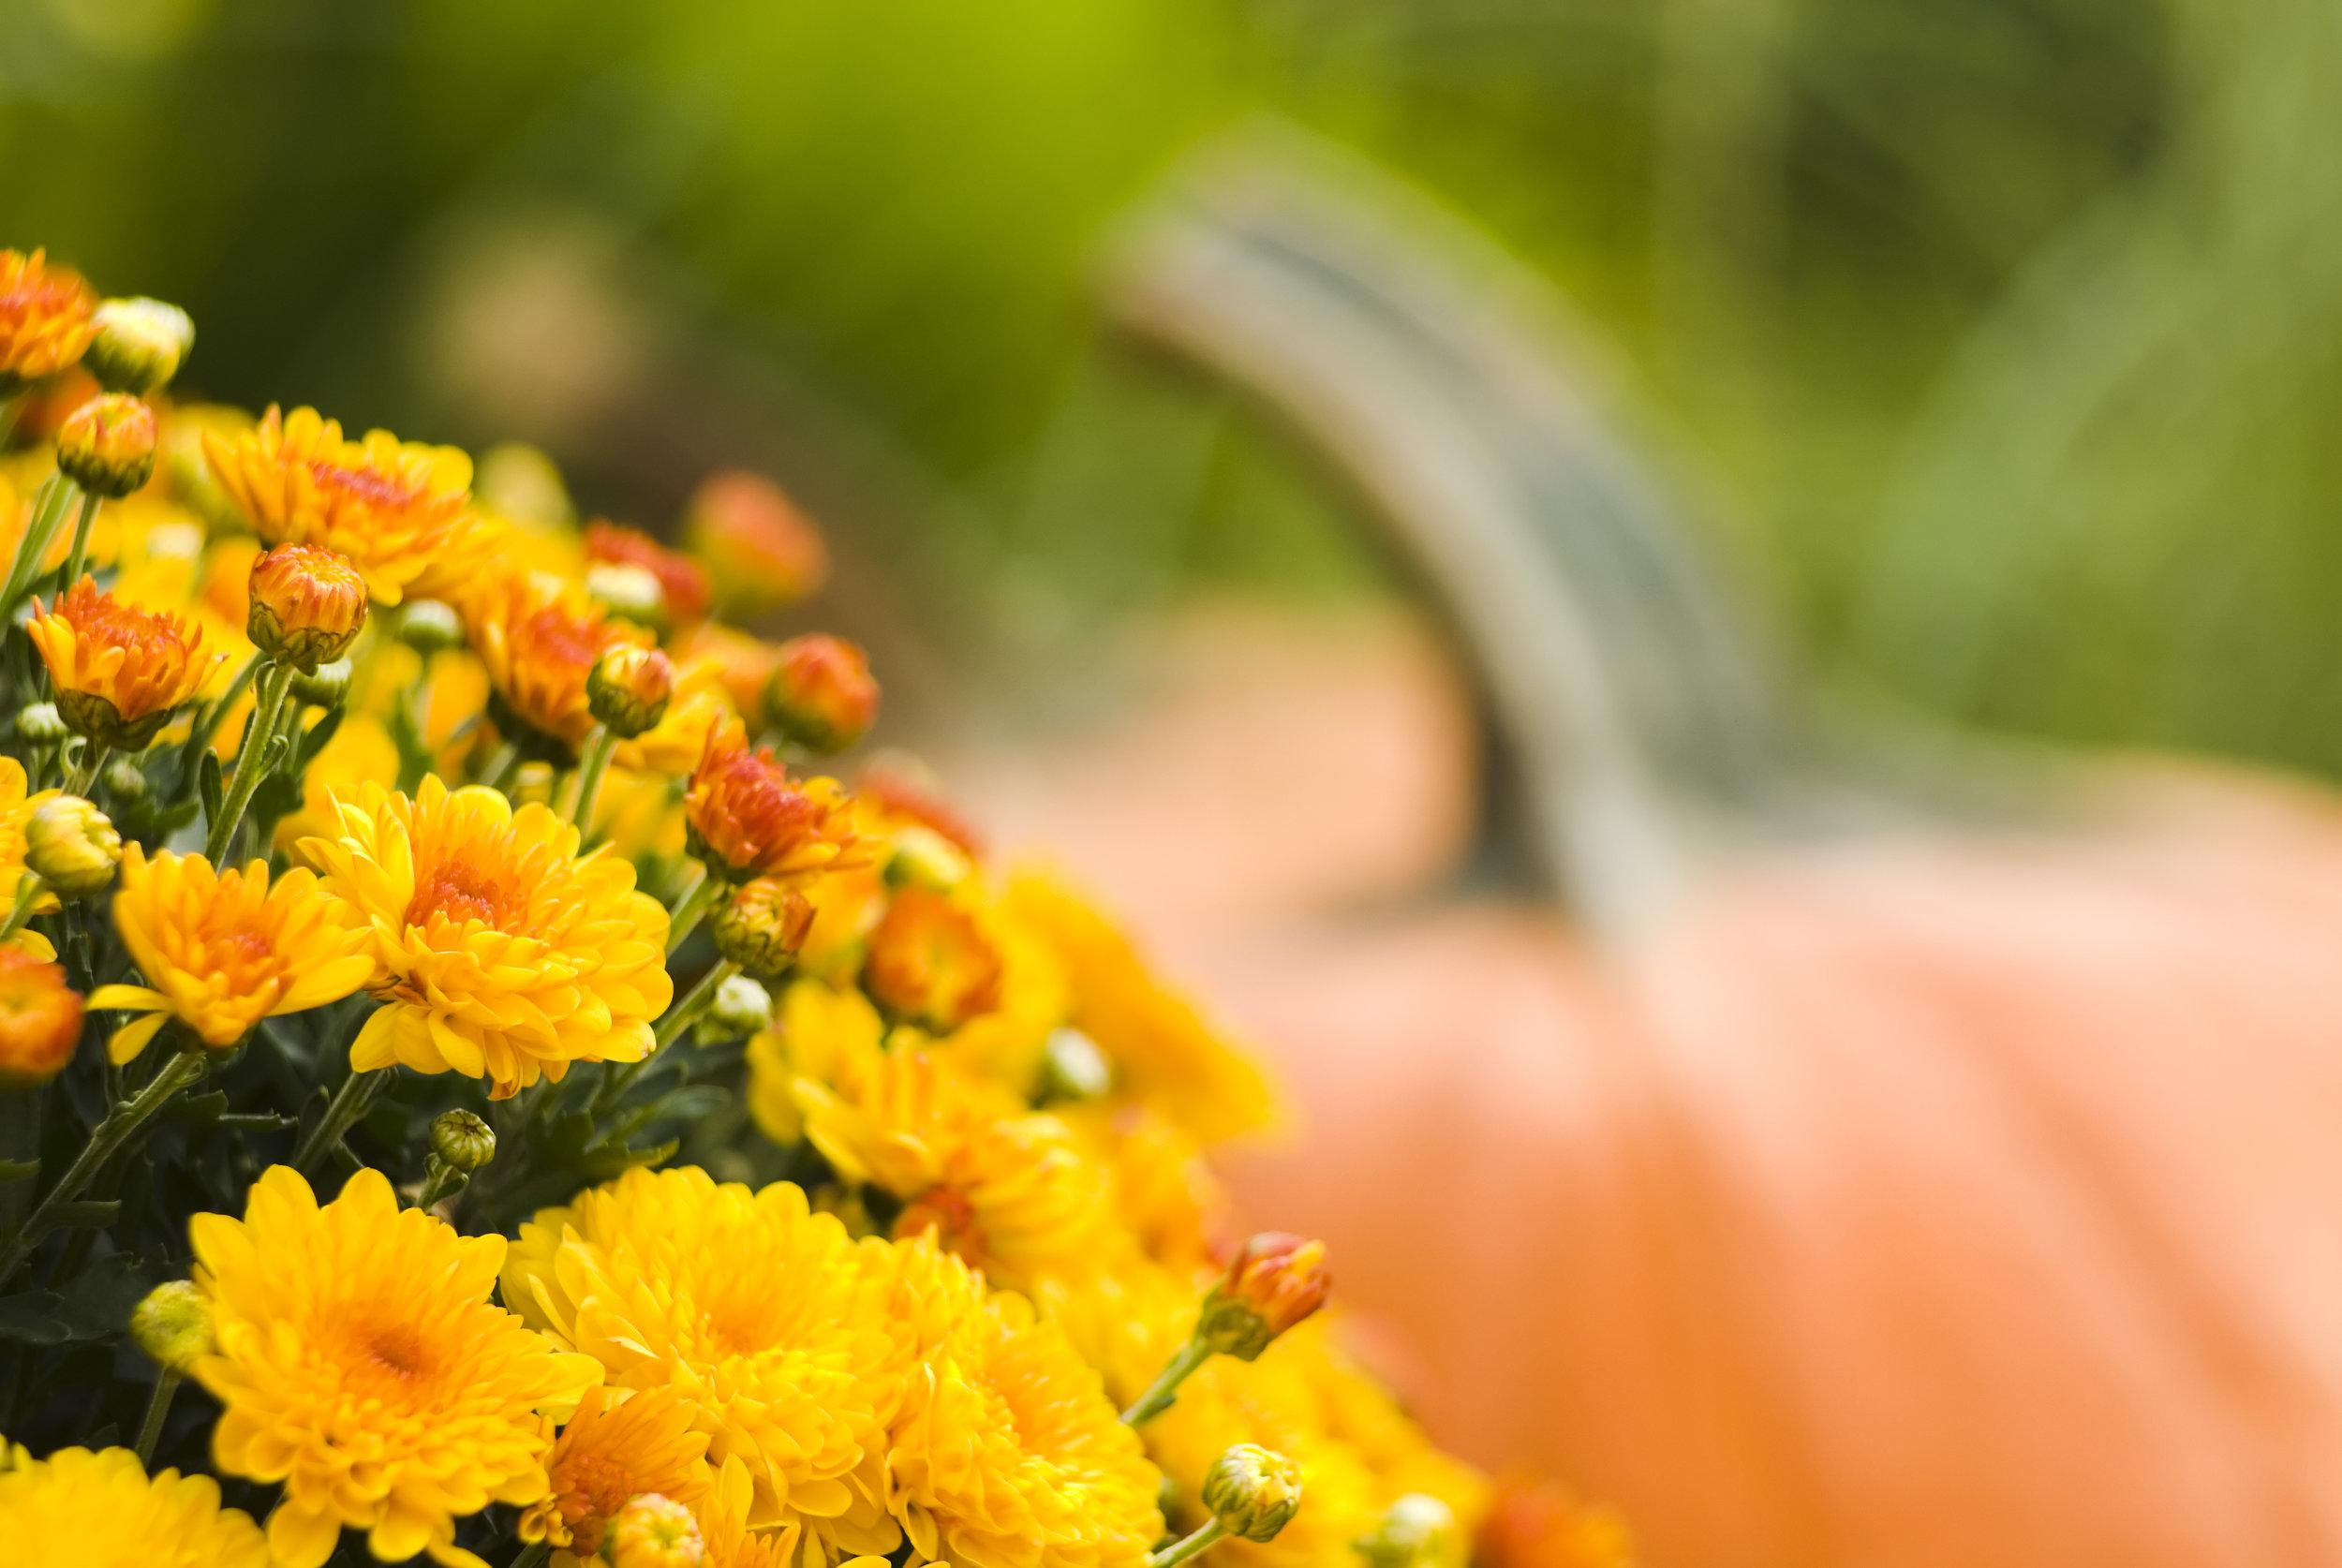 Pumpkins-and-mums---IV-157384323_3872x2592.jpeg